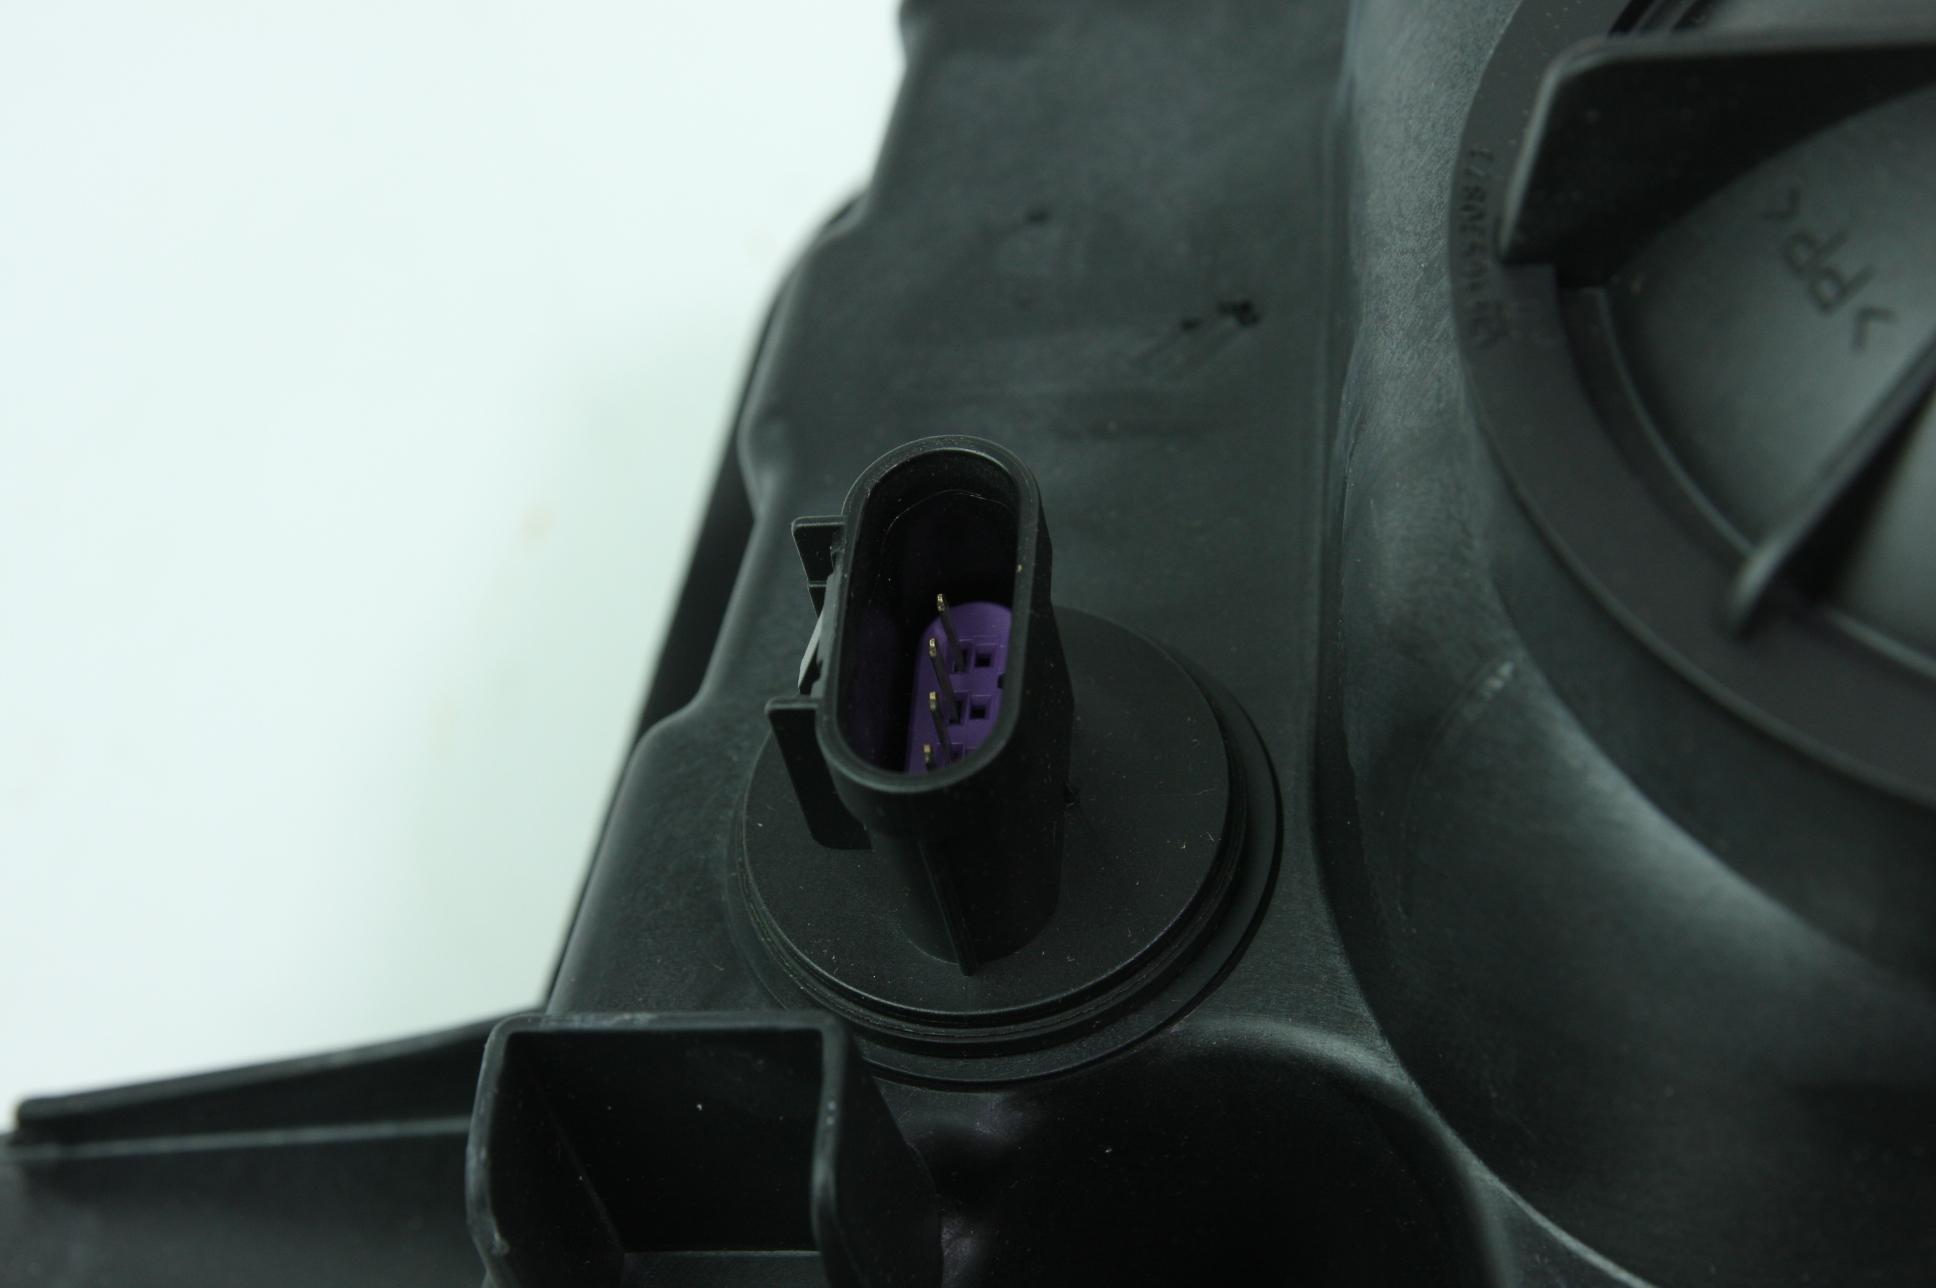 New Genuine OEM GM 22959920 Right Headlight Assembly 10-15 Chevy Camaro NIP - image 9